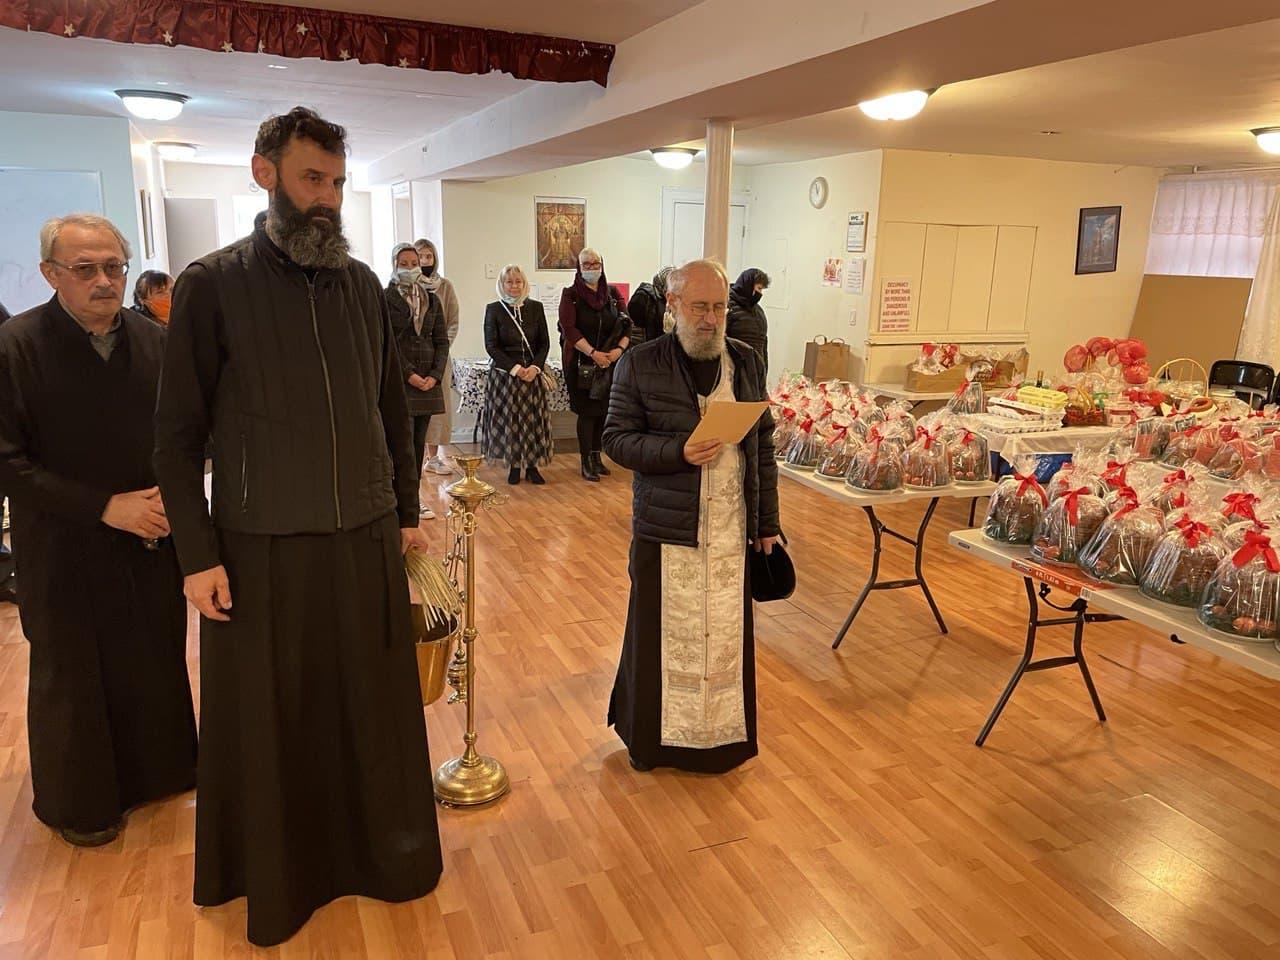 Easter_Brooklyn-Church_2021-5-02_09